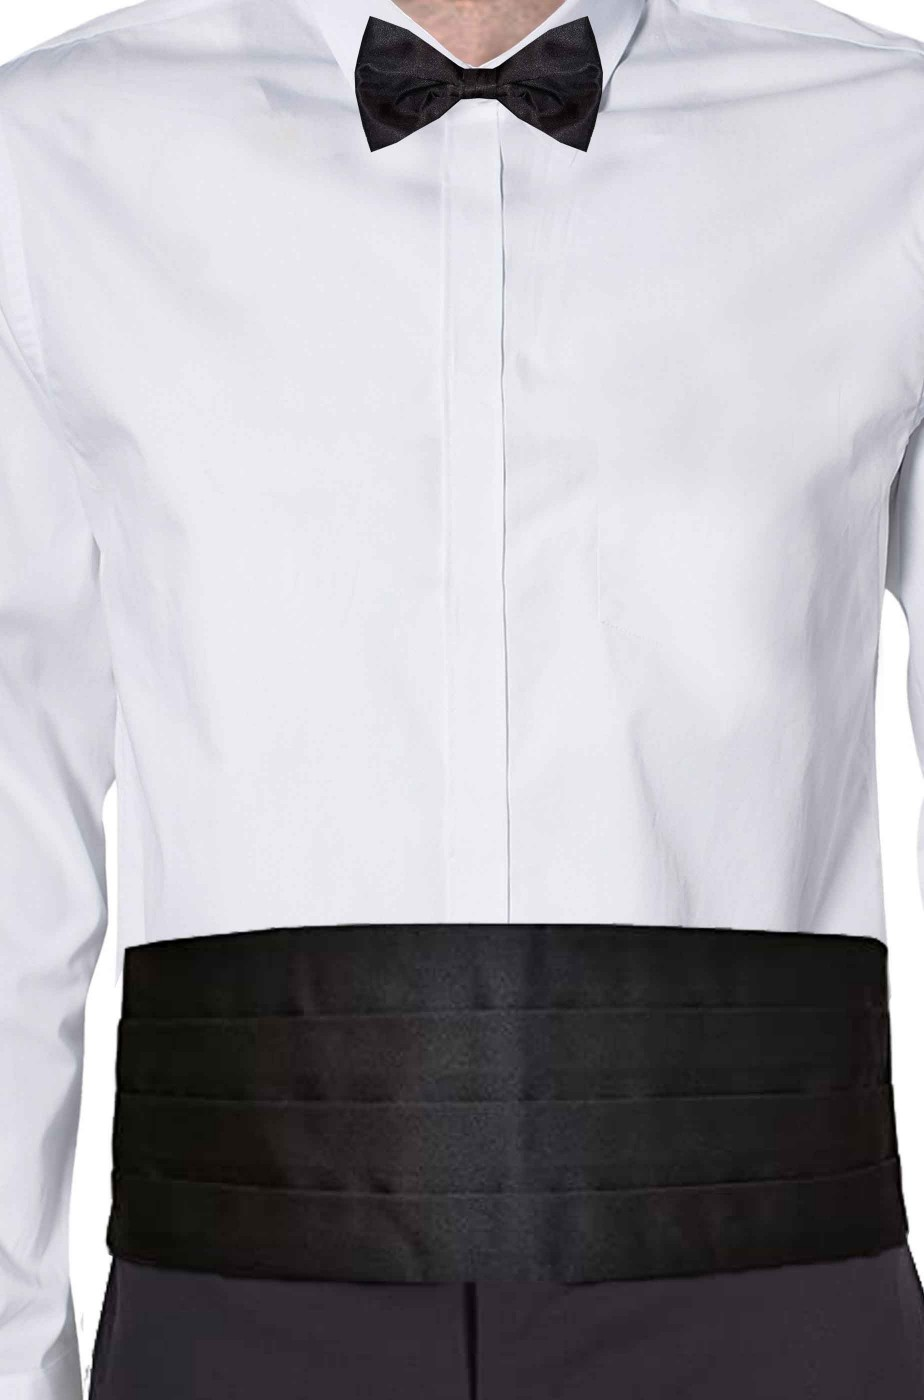 Fascia a fusciacca da smoking nera e cravattino